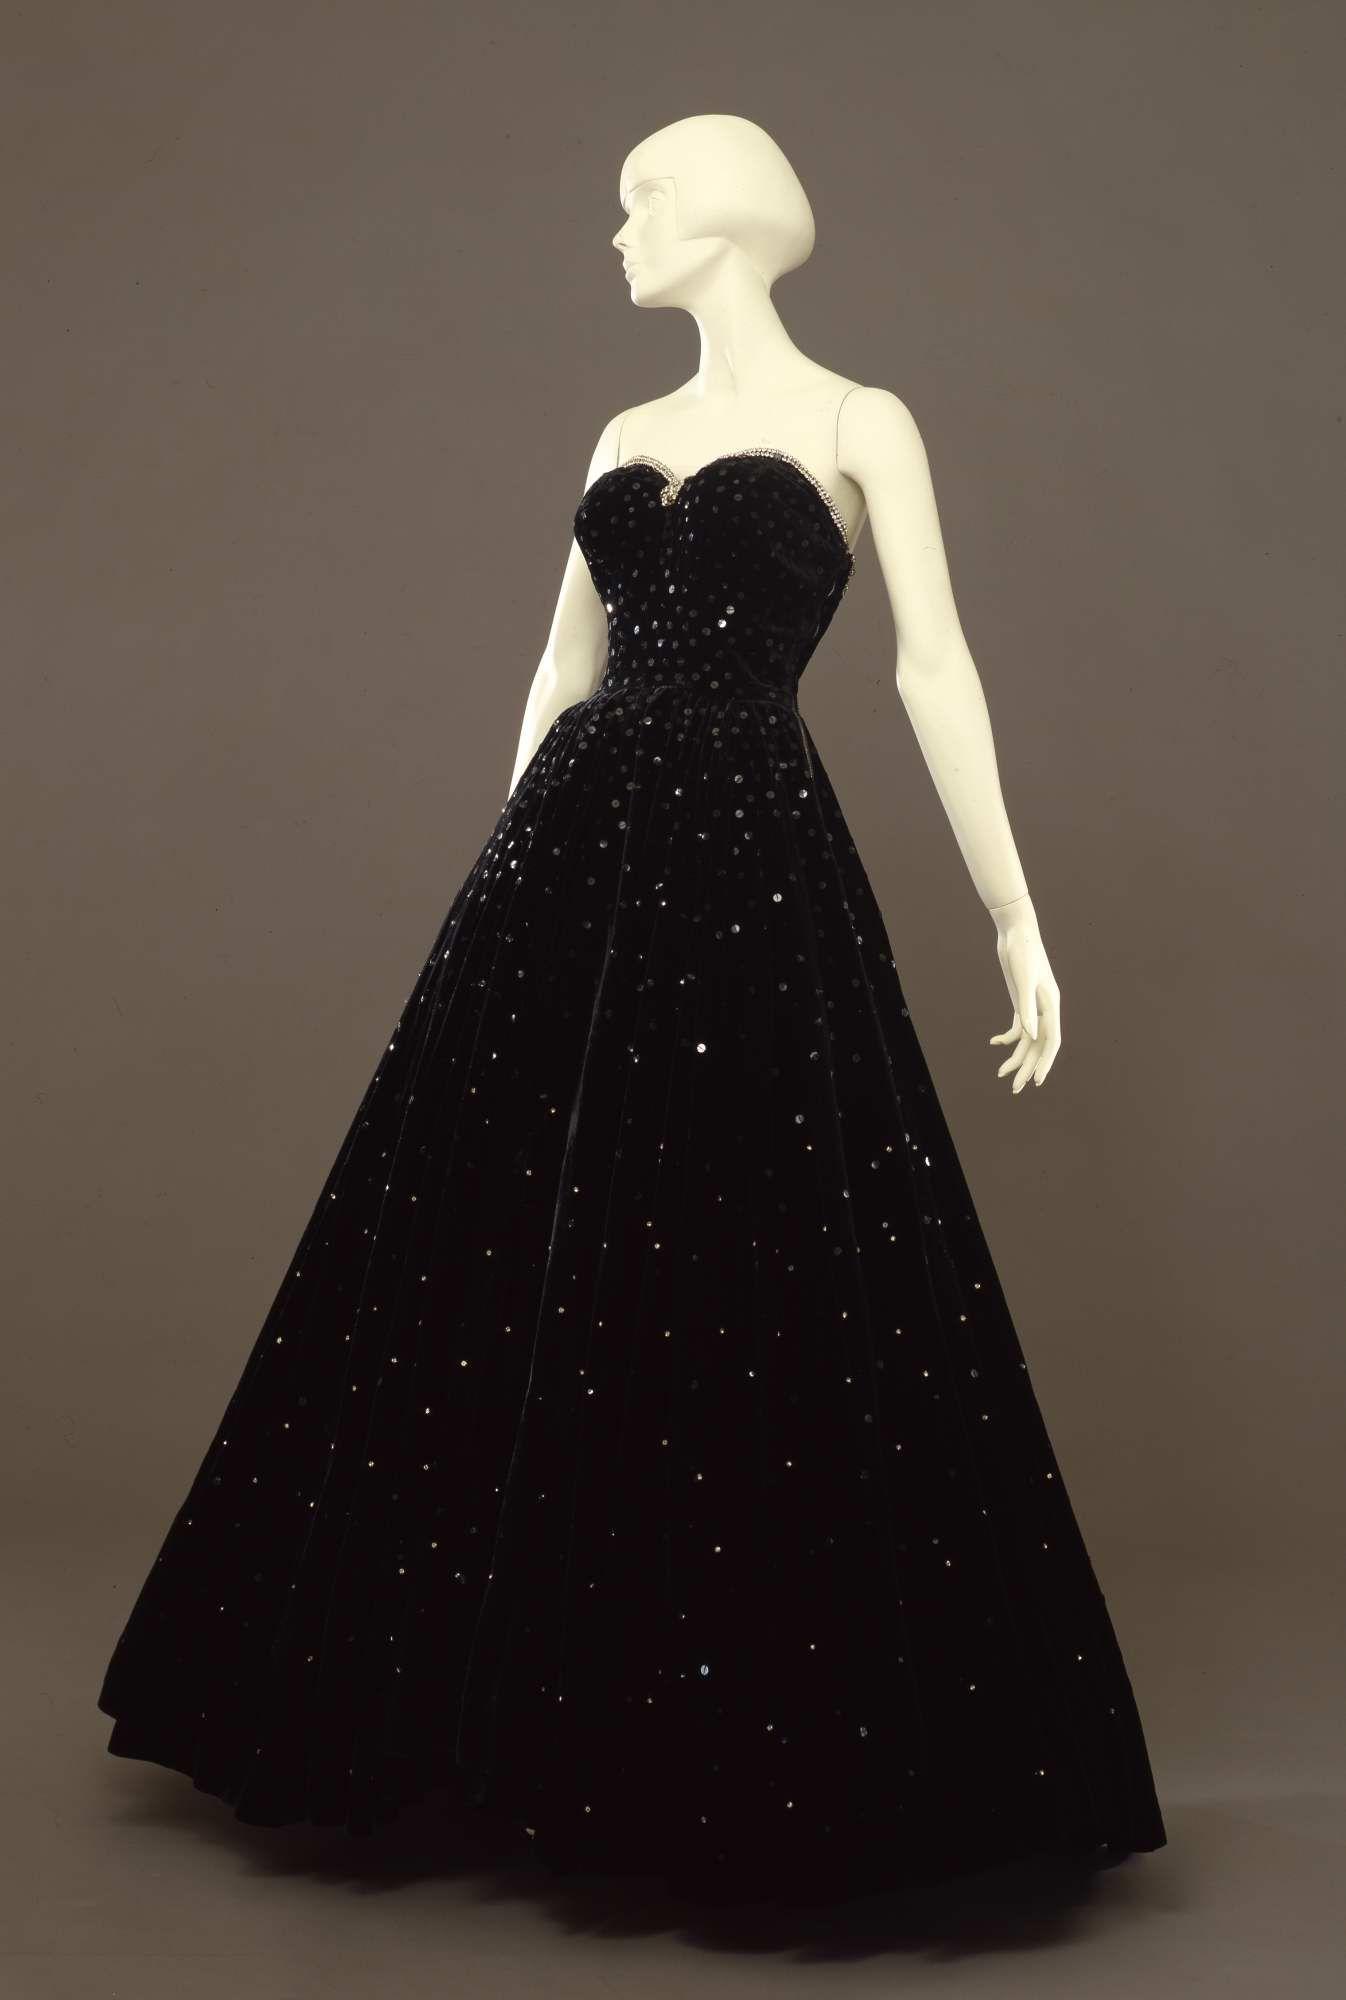 7e4db6d8ac18 1947, Italy - Ball gown - Velvet, rhinestones, sequins  www.vintageclothin.com